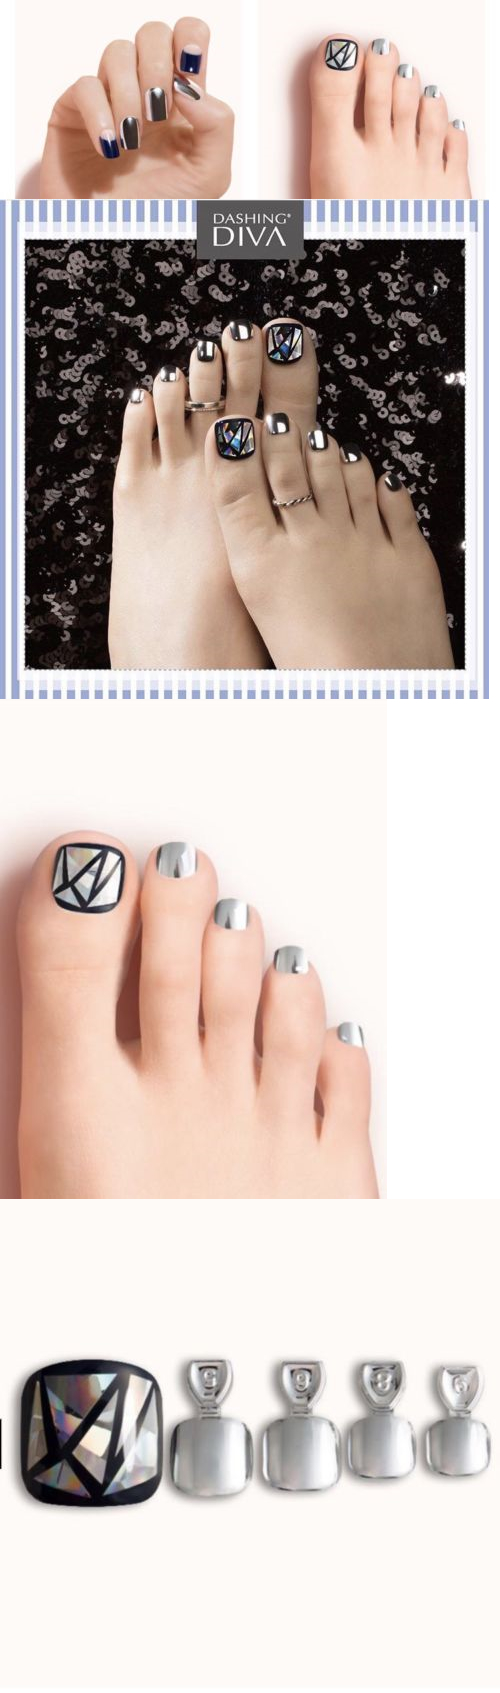 Press-On Nails: Dashing Diva Press On Nails Toe And Finger Nails ...